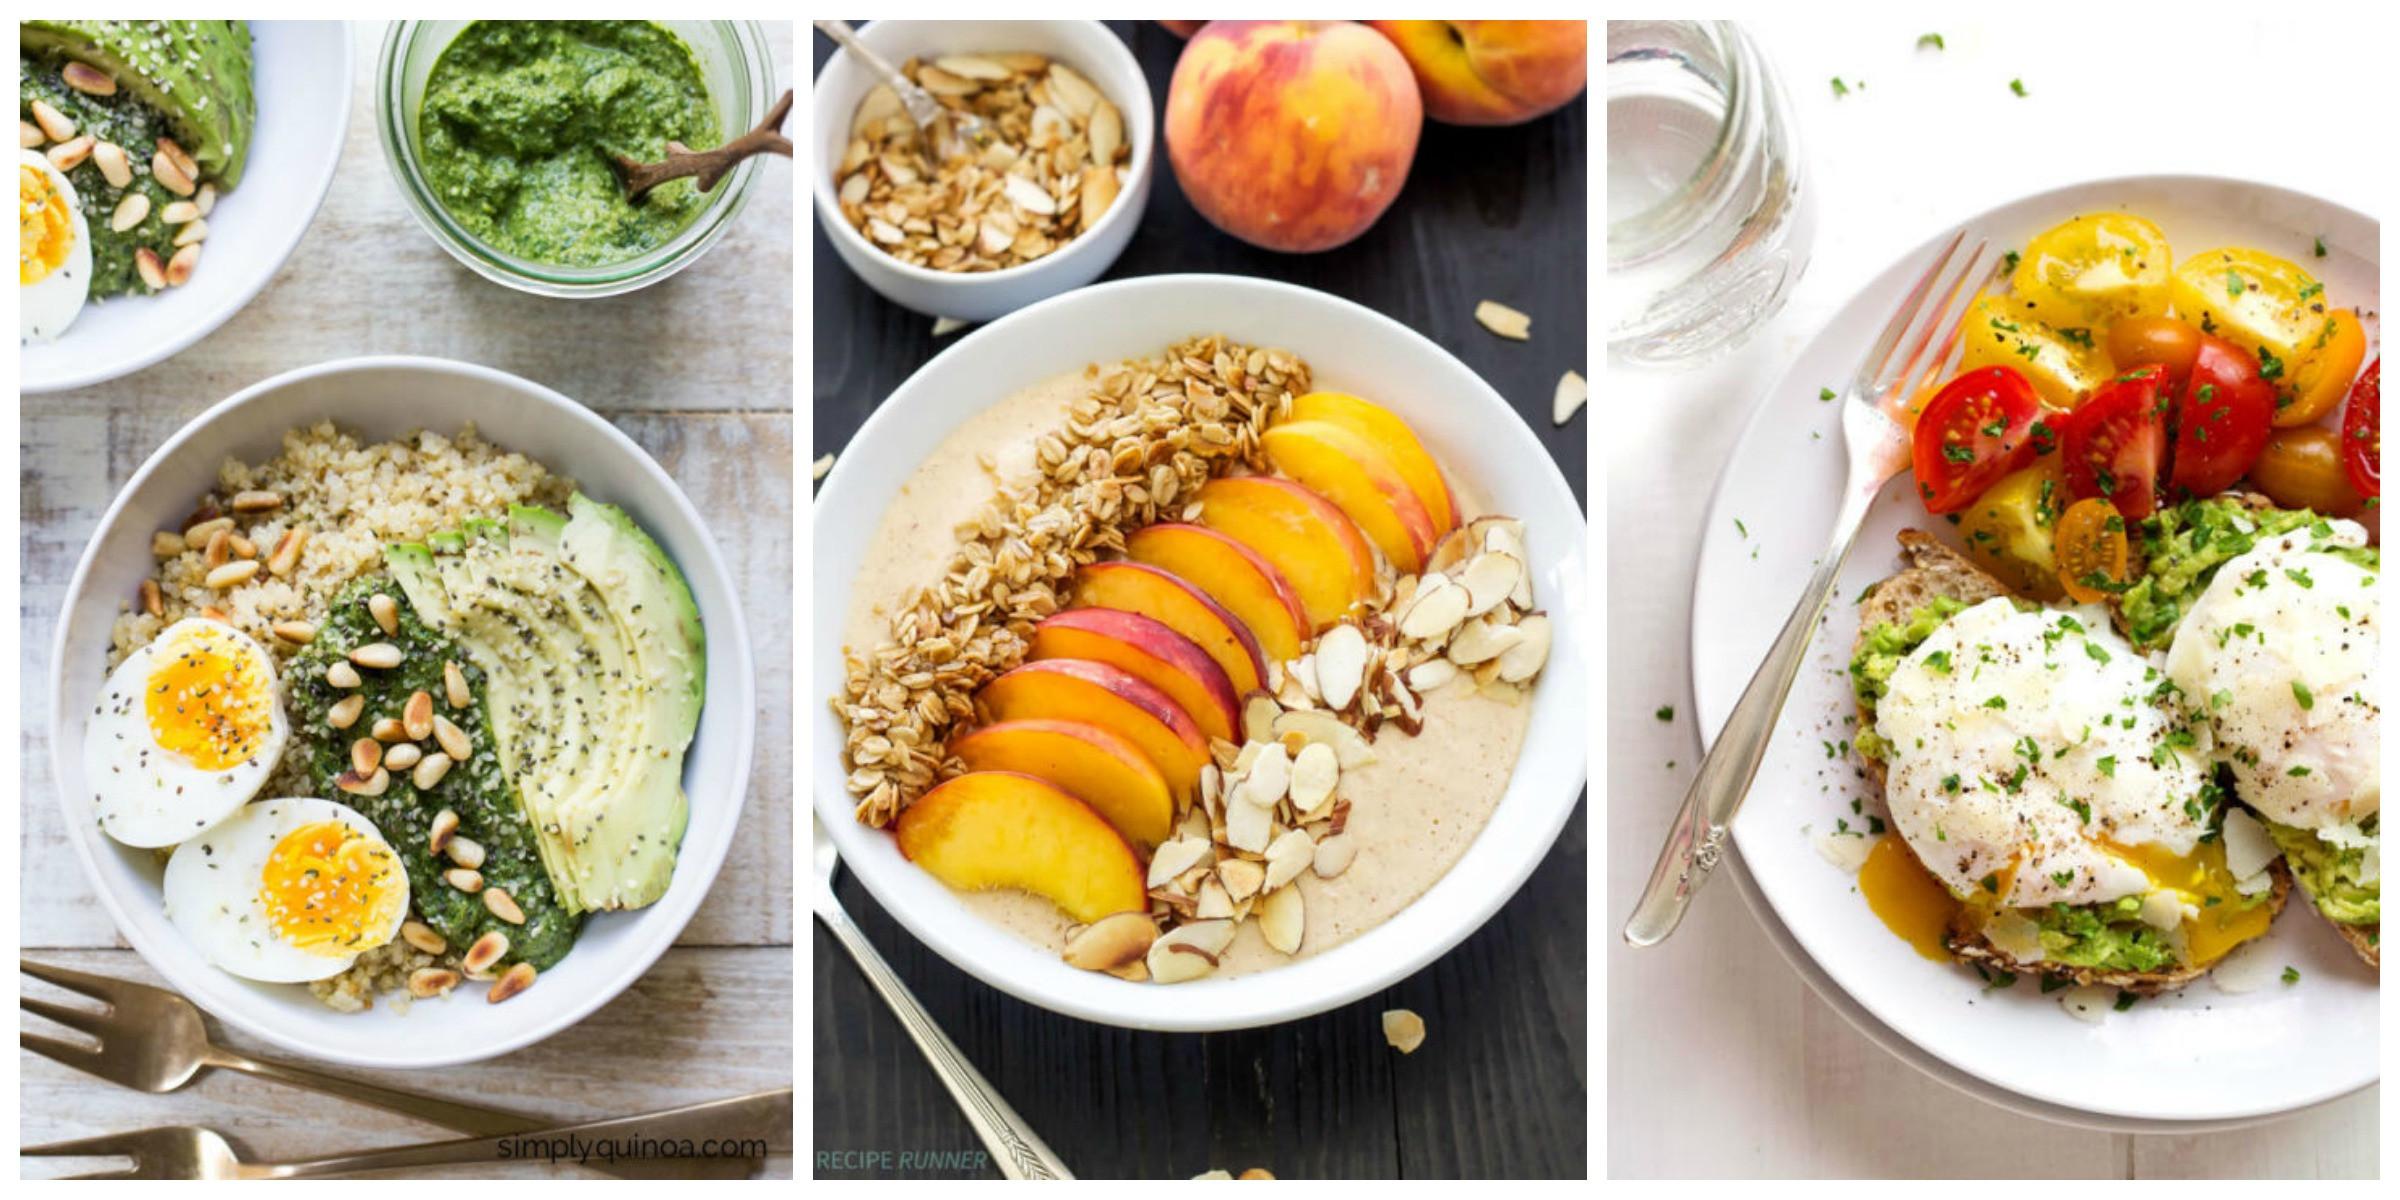 A Good Healthy Breakfast  20 Best Healthy Breakfast Food Ideas Recipes for Healthy